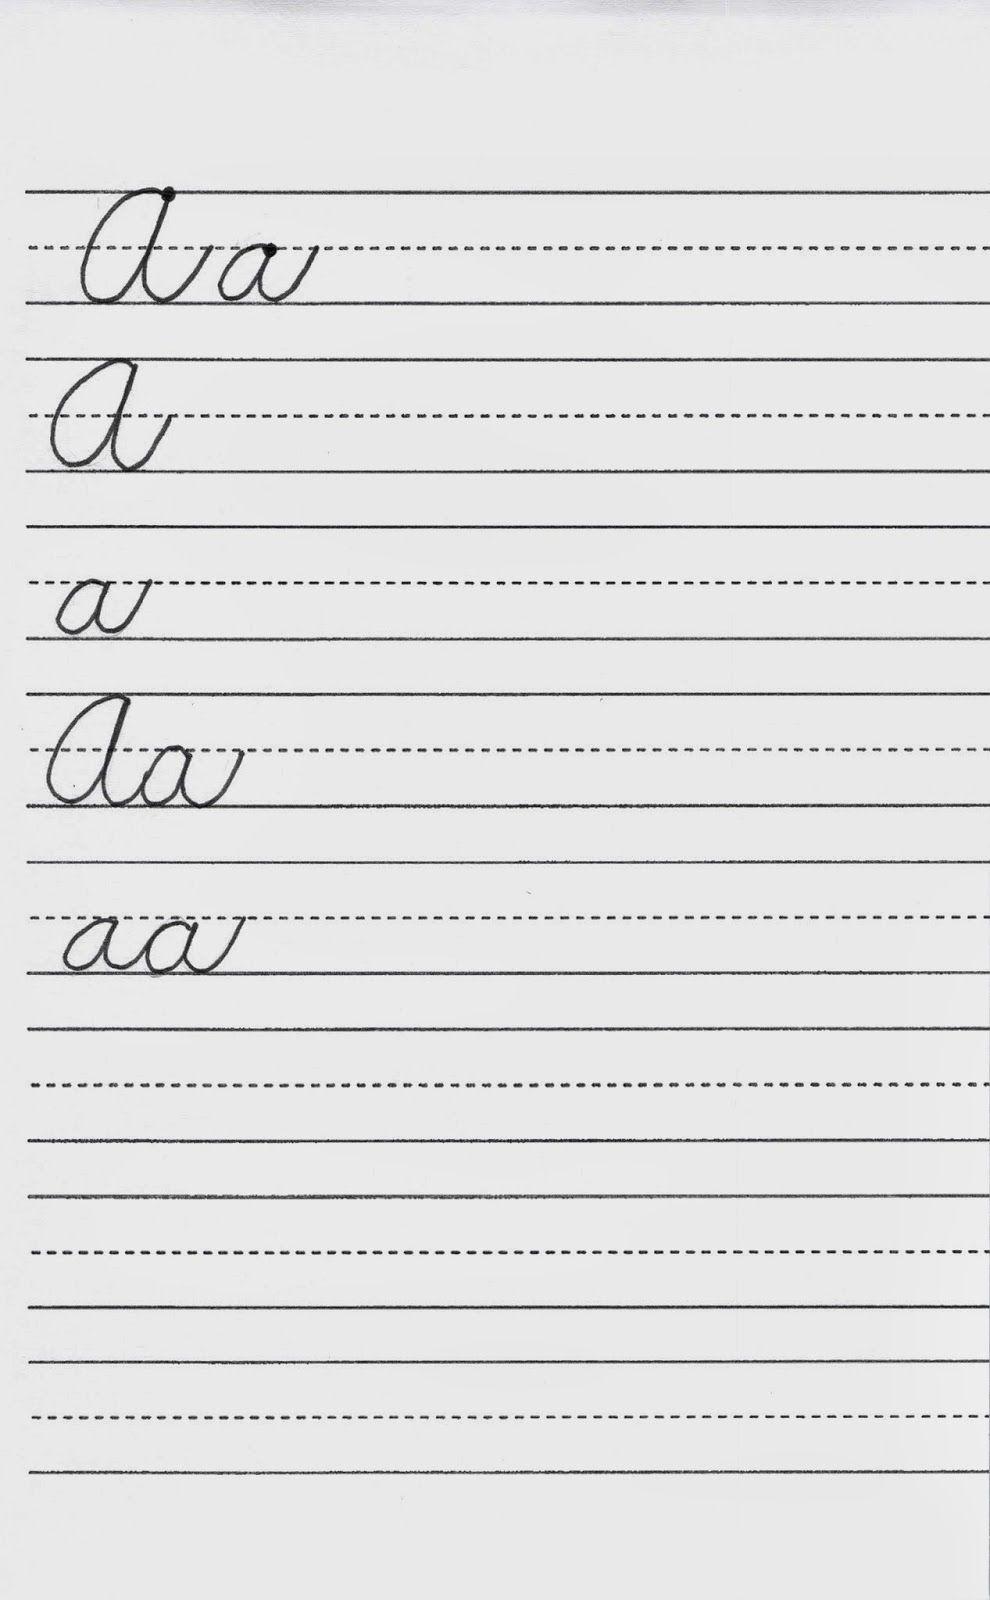 Introducing The Cursive Project Learning Cursive Cursive Cursive Writing [ 1600 x 990 Pixel ]